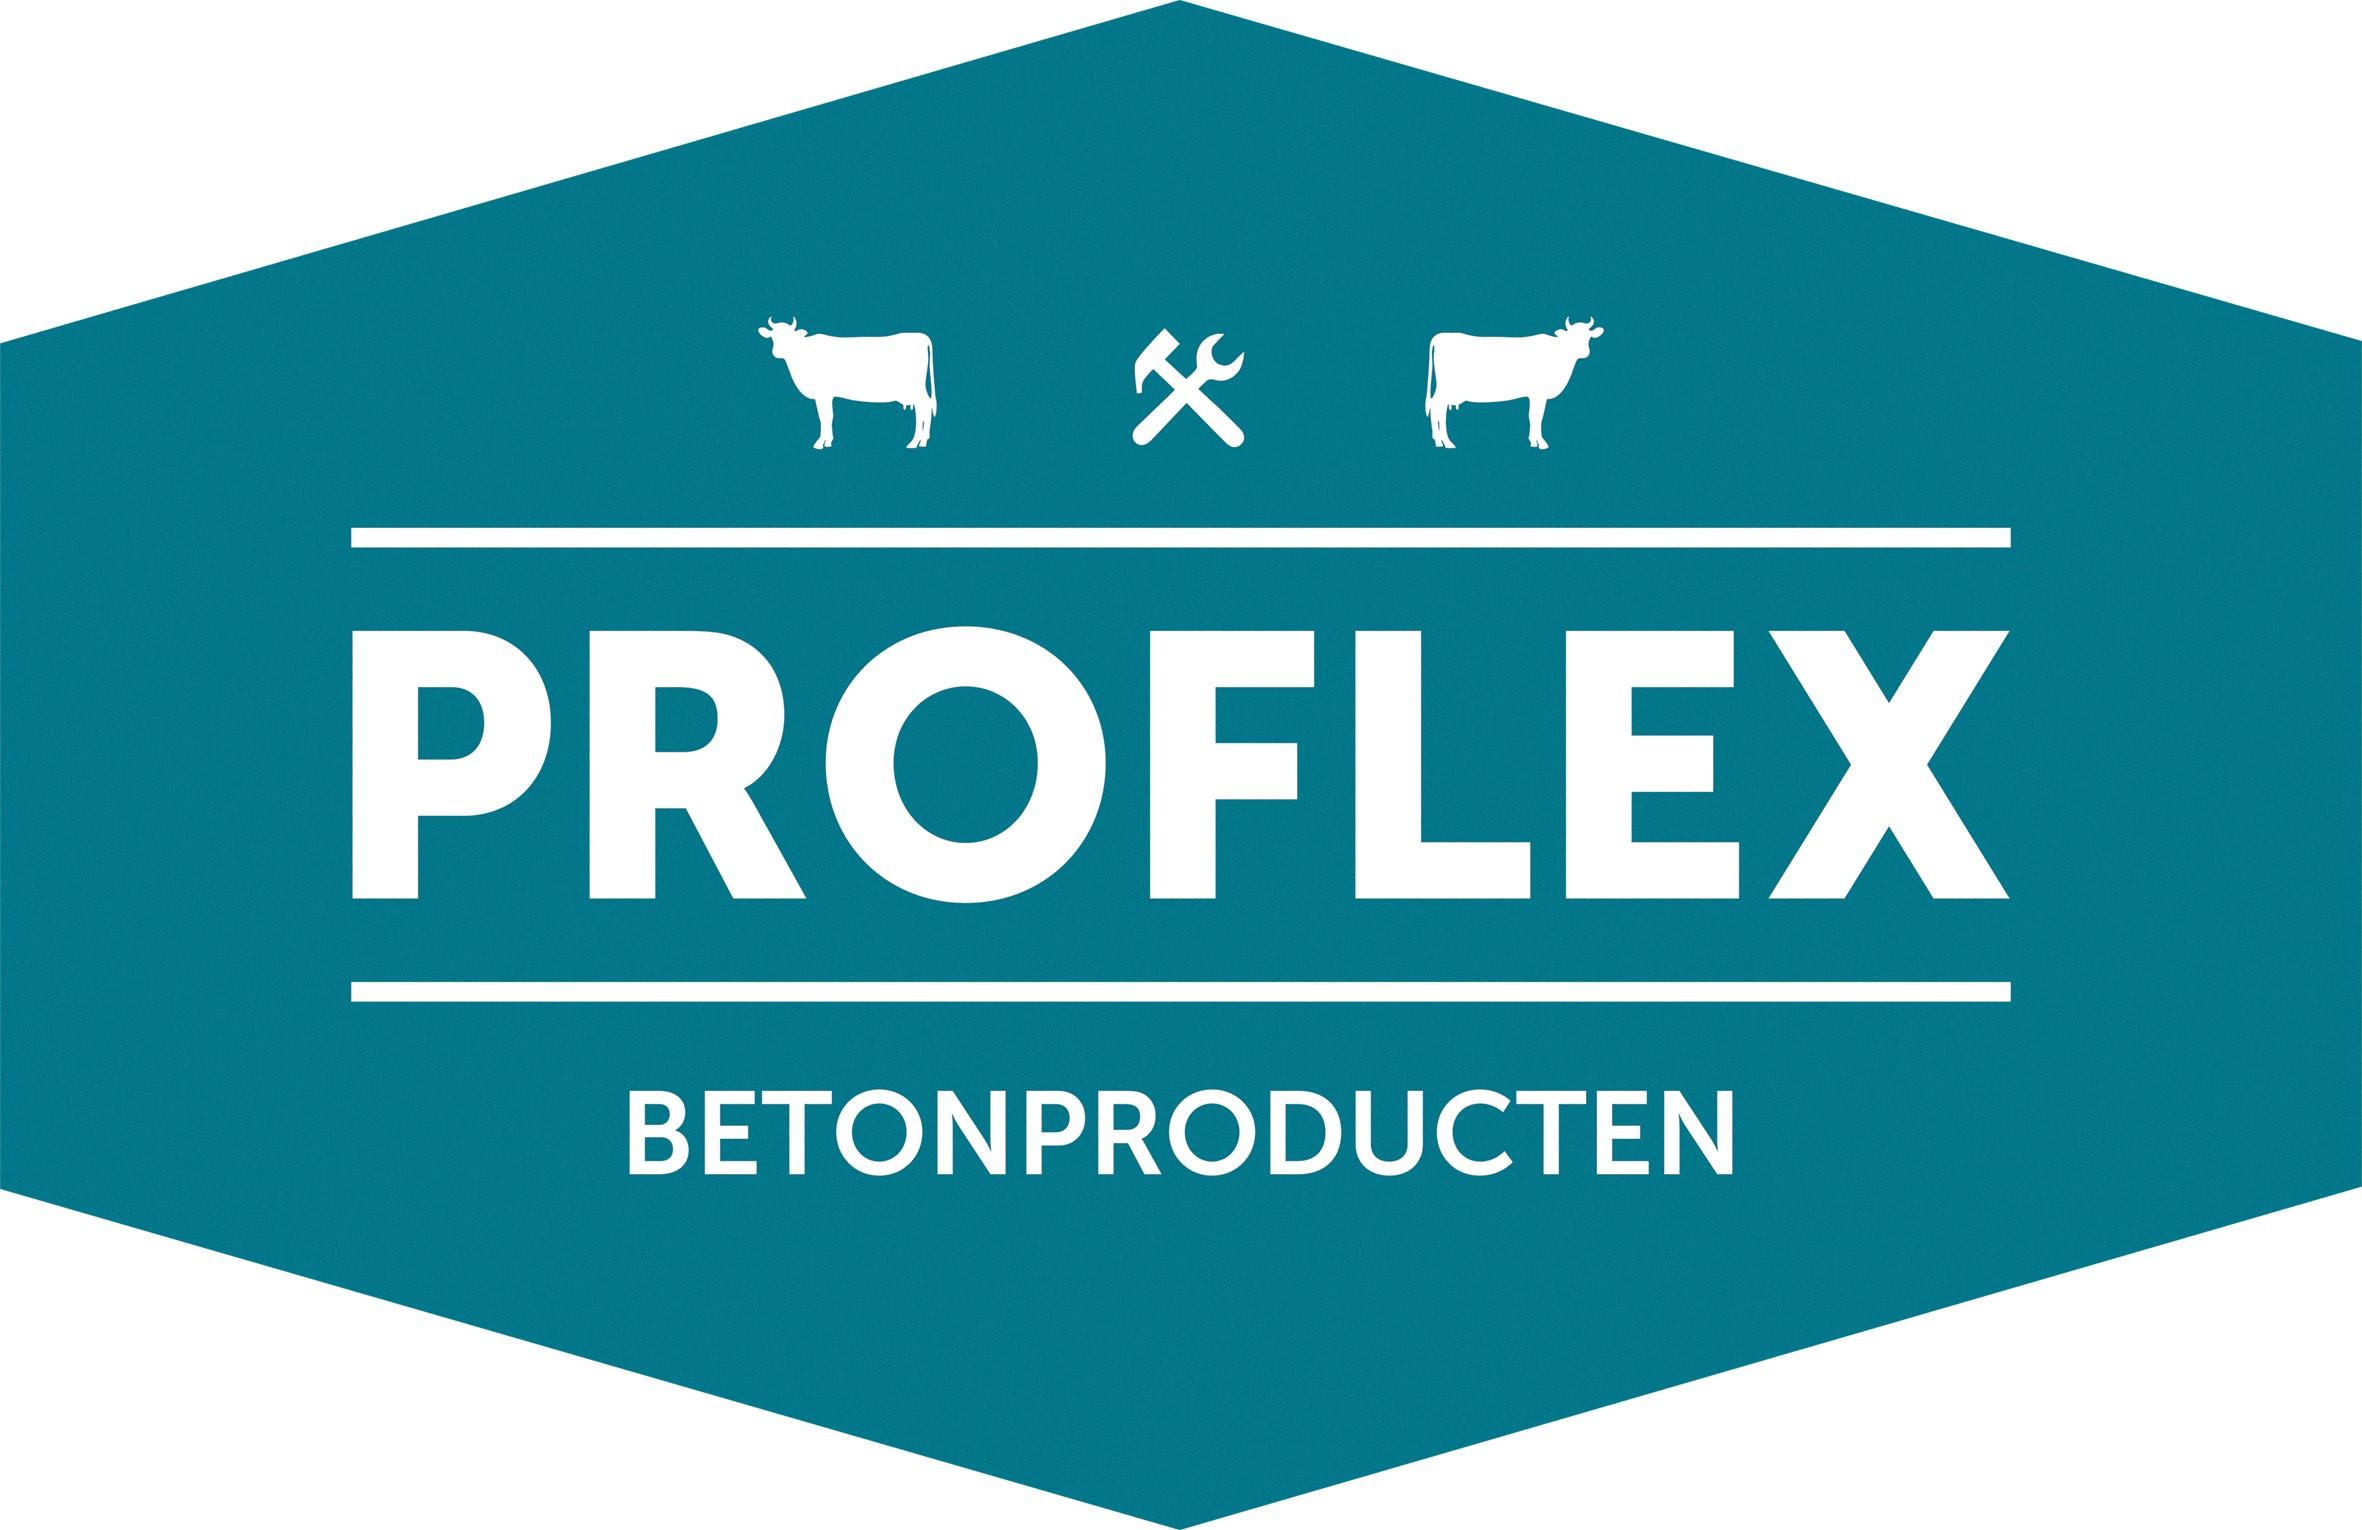 Proflex